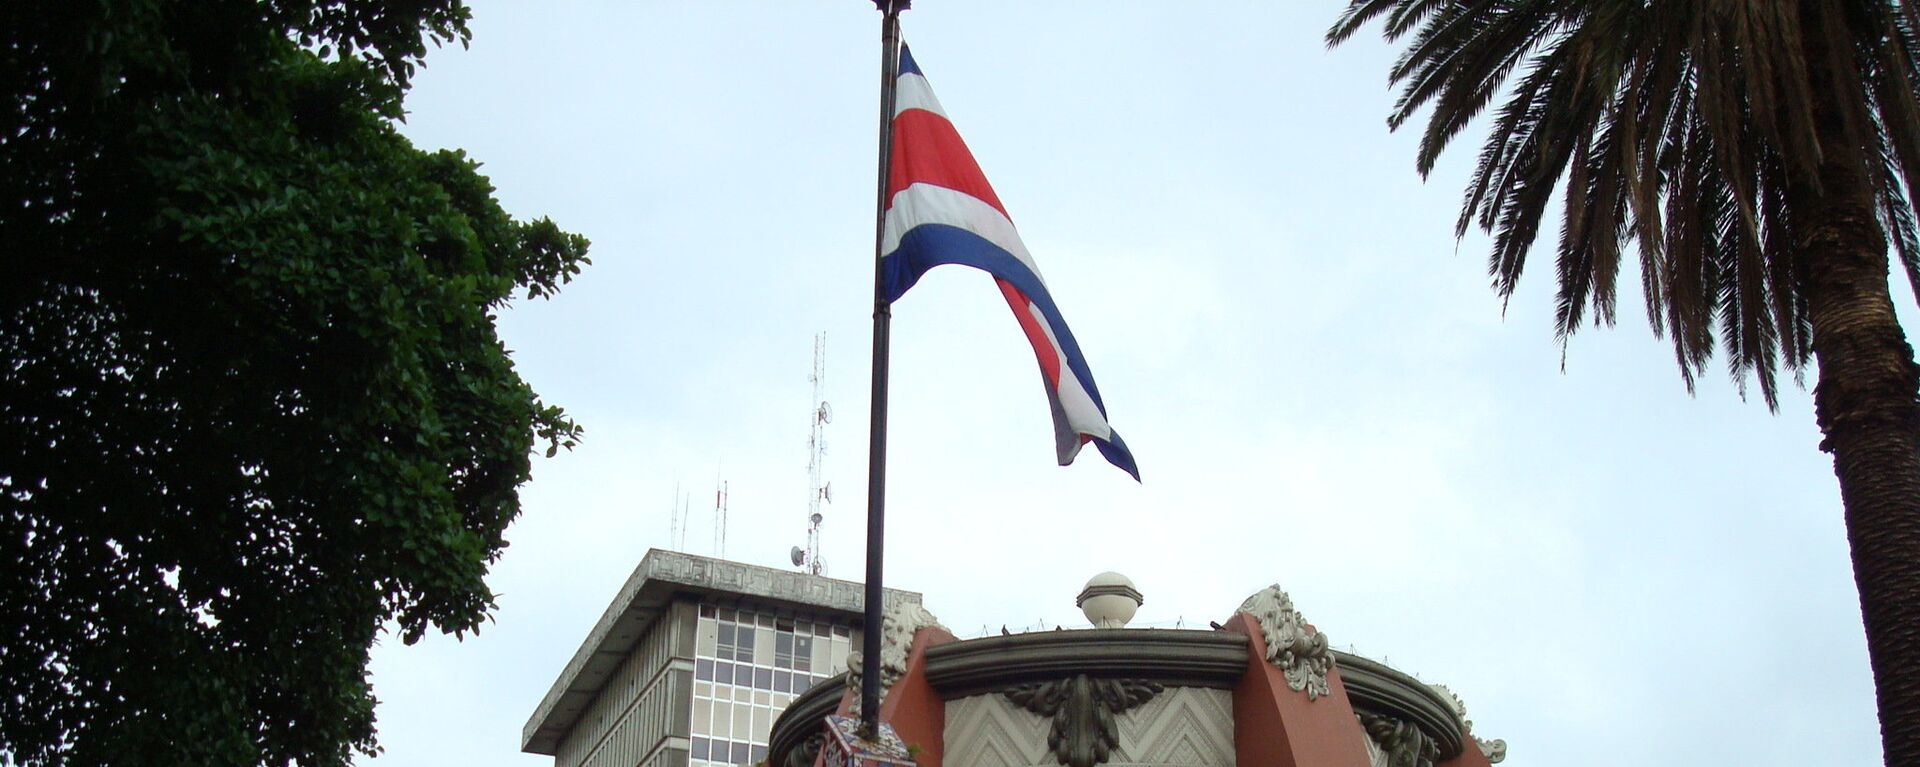 La bandera de Costa Rica en San José, la capital del país - Sputnik Mundo, 1920, 04.04.2021